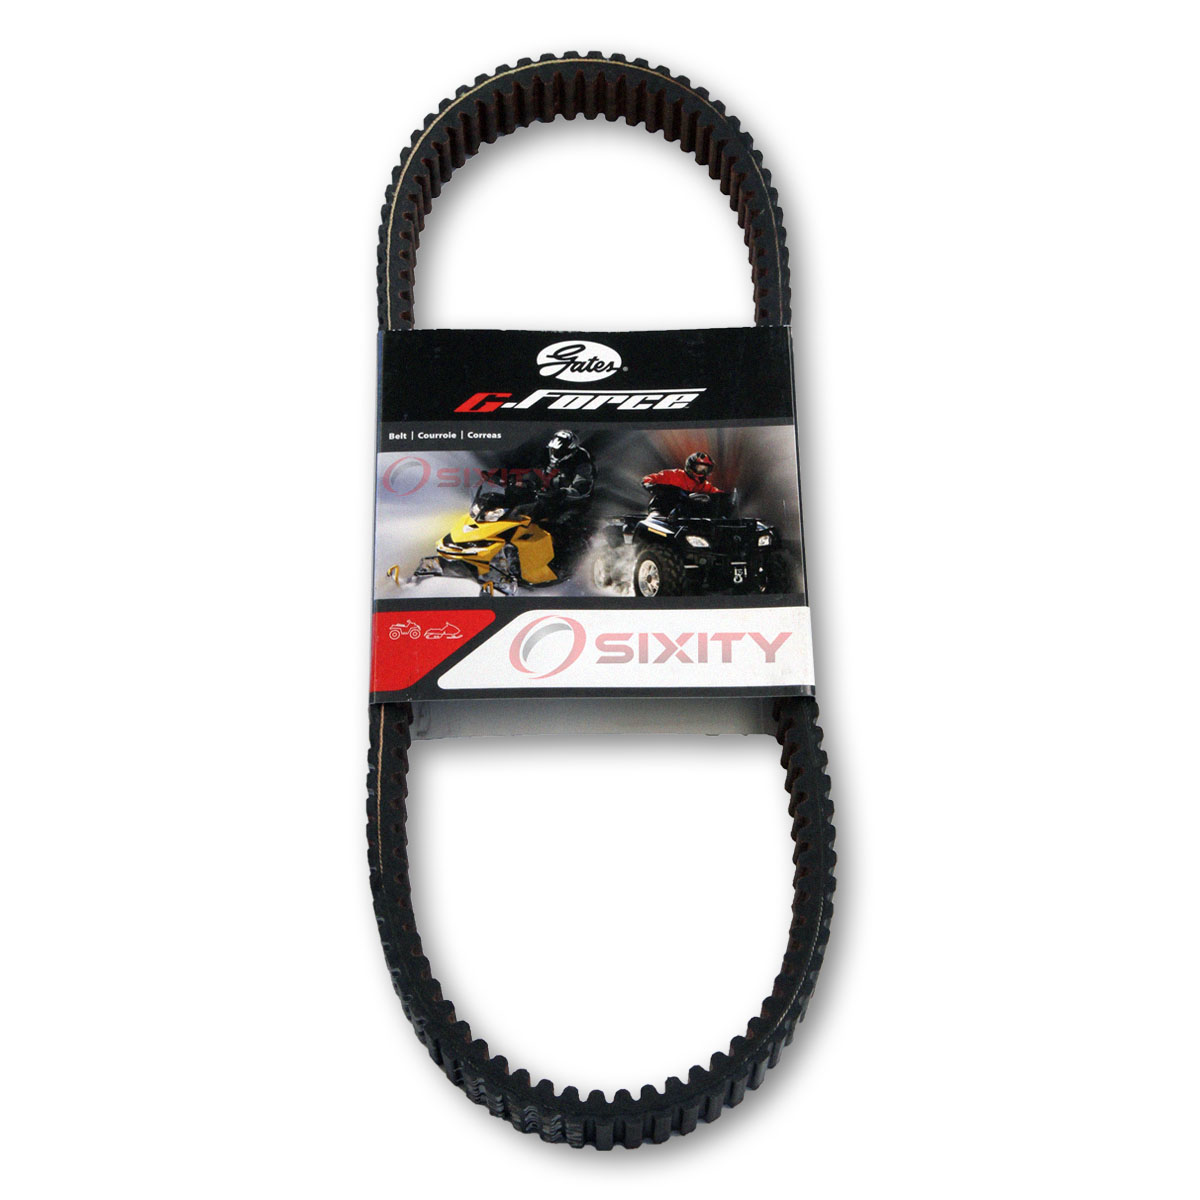 Gates 36G4368 Drive Belt G-Force